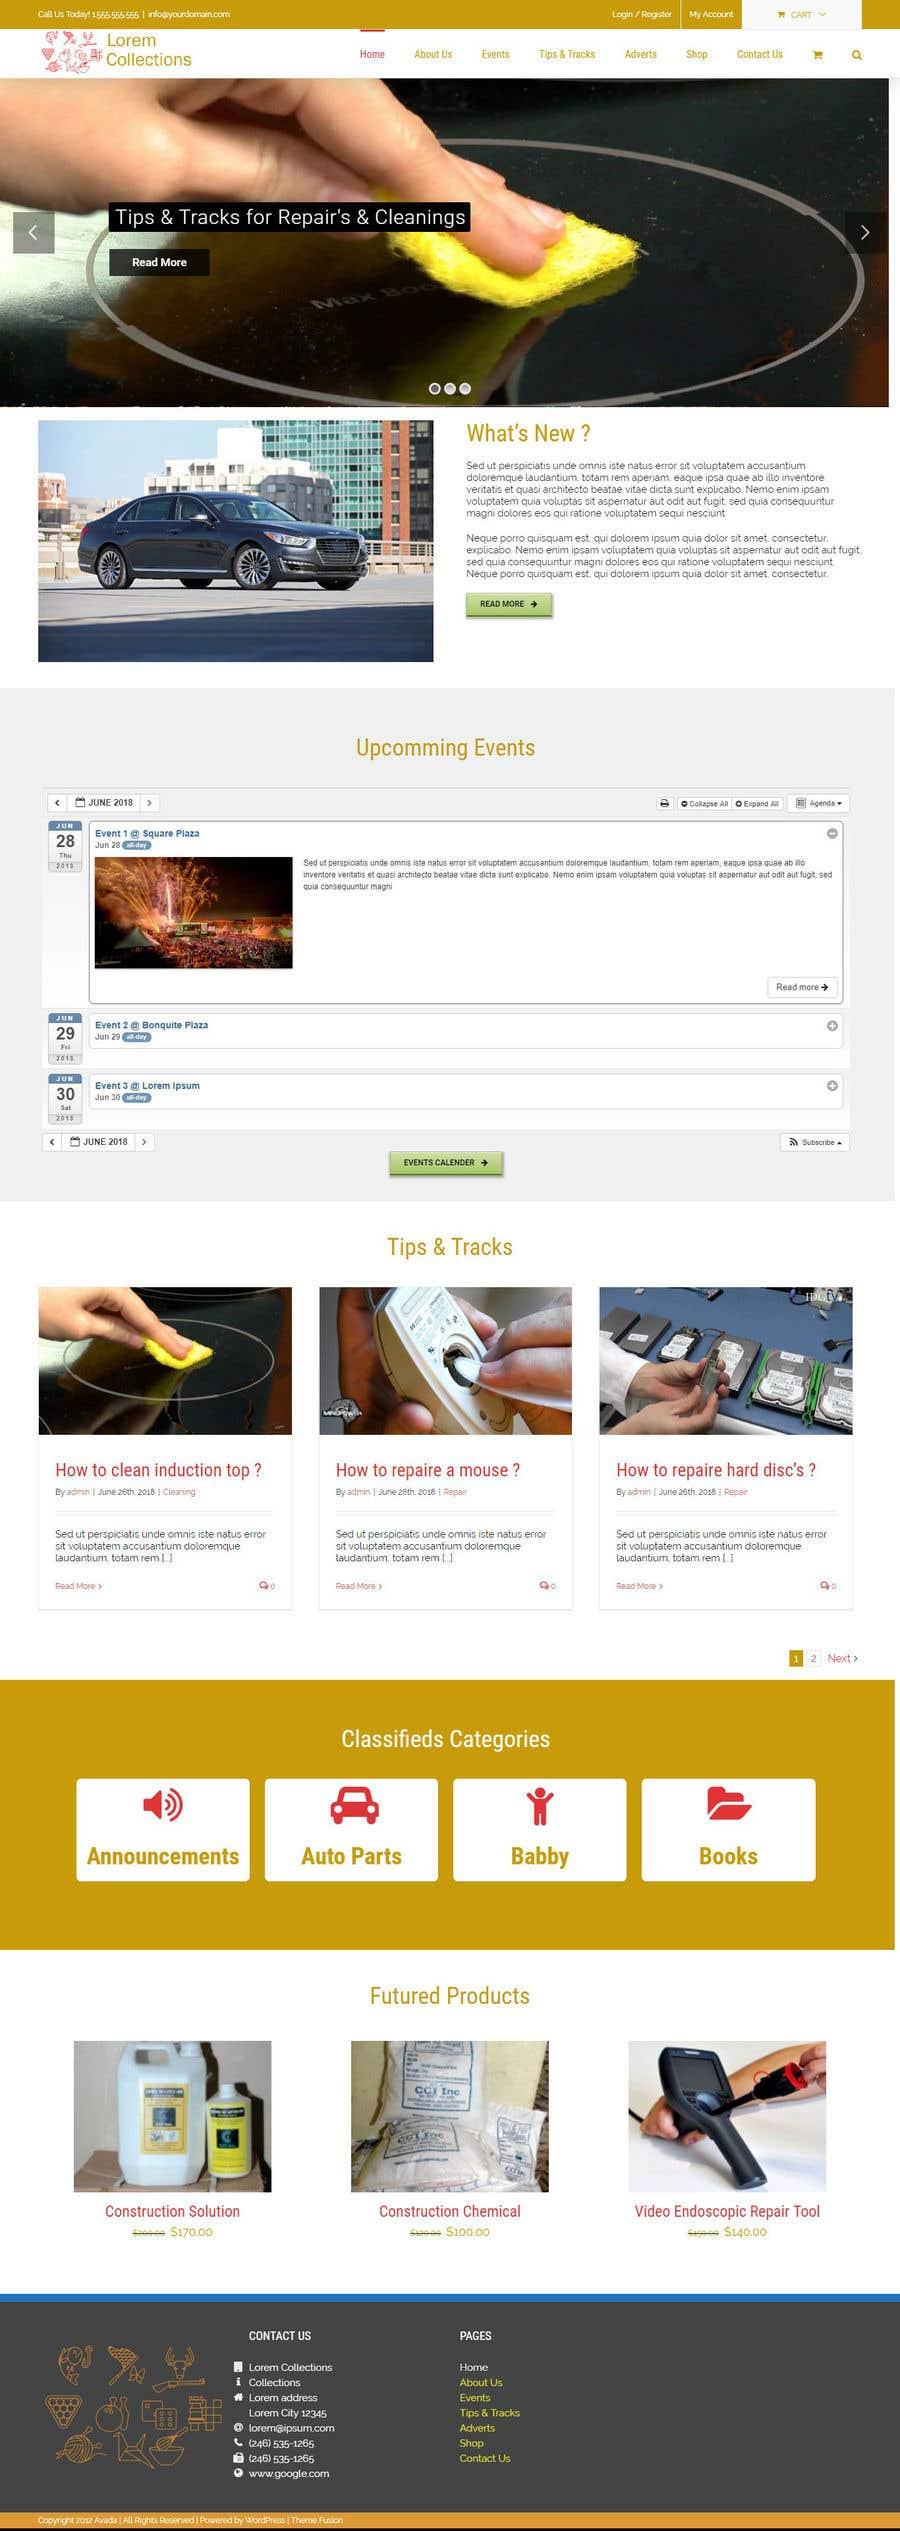 Penyertaan Peraduan #7 untuk Build a reusable hobby website